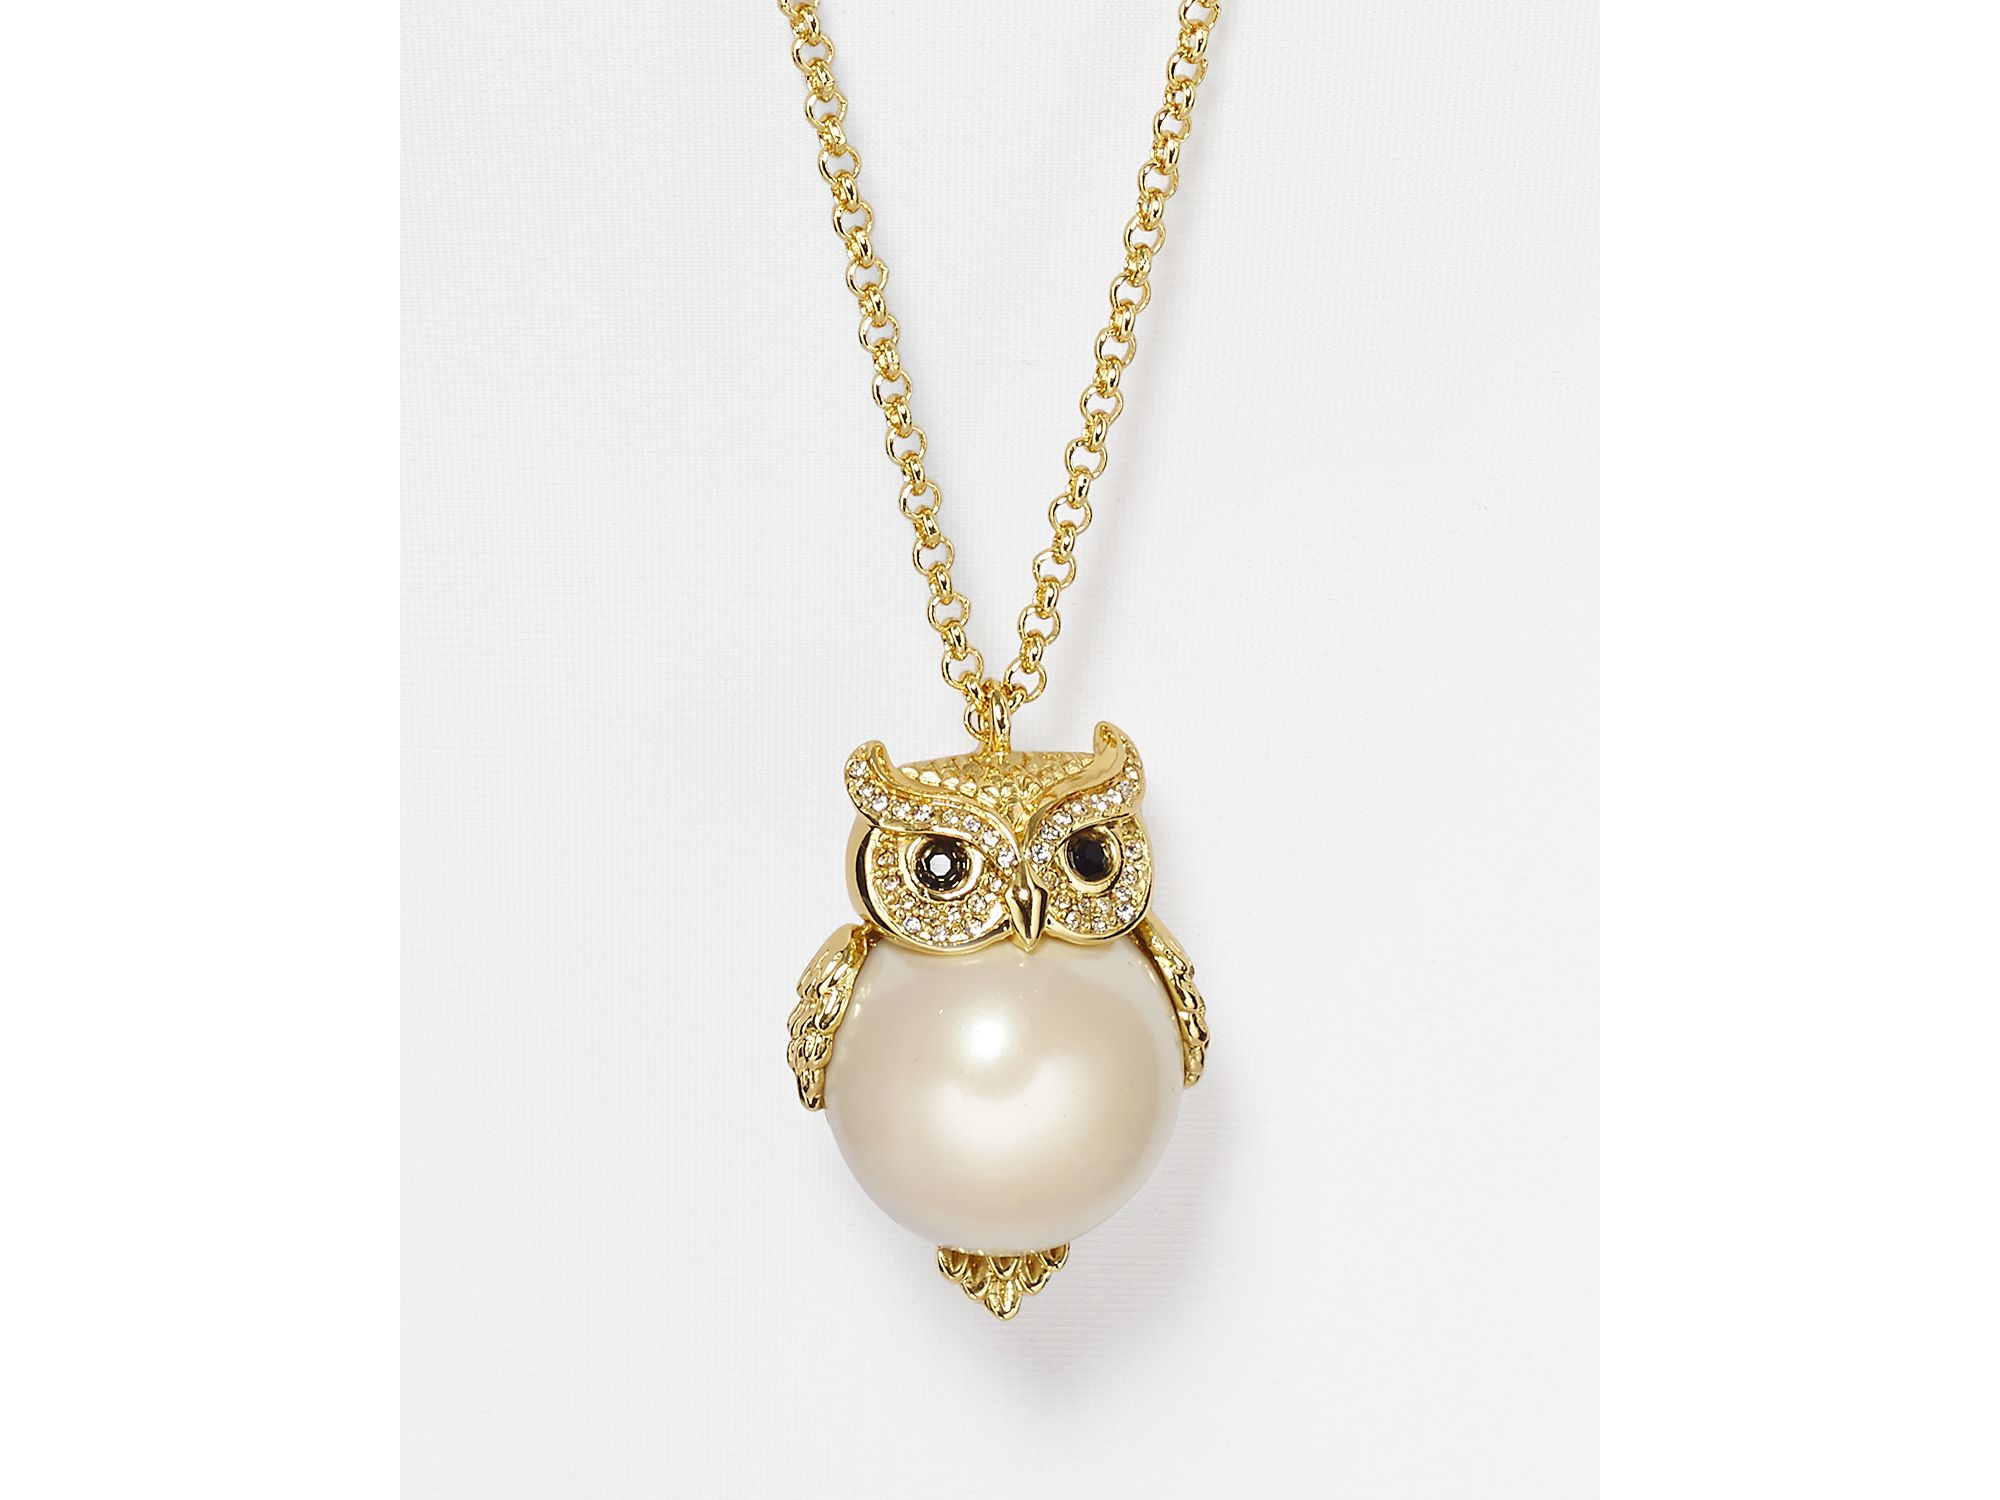 92887706915a7 kate spade new york Metallic Faux Pearl Owl Pendant Necklace, 32